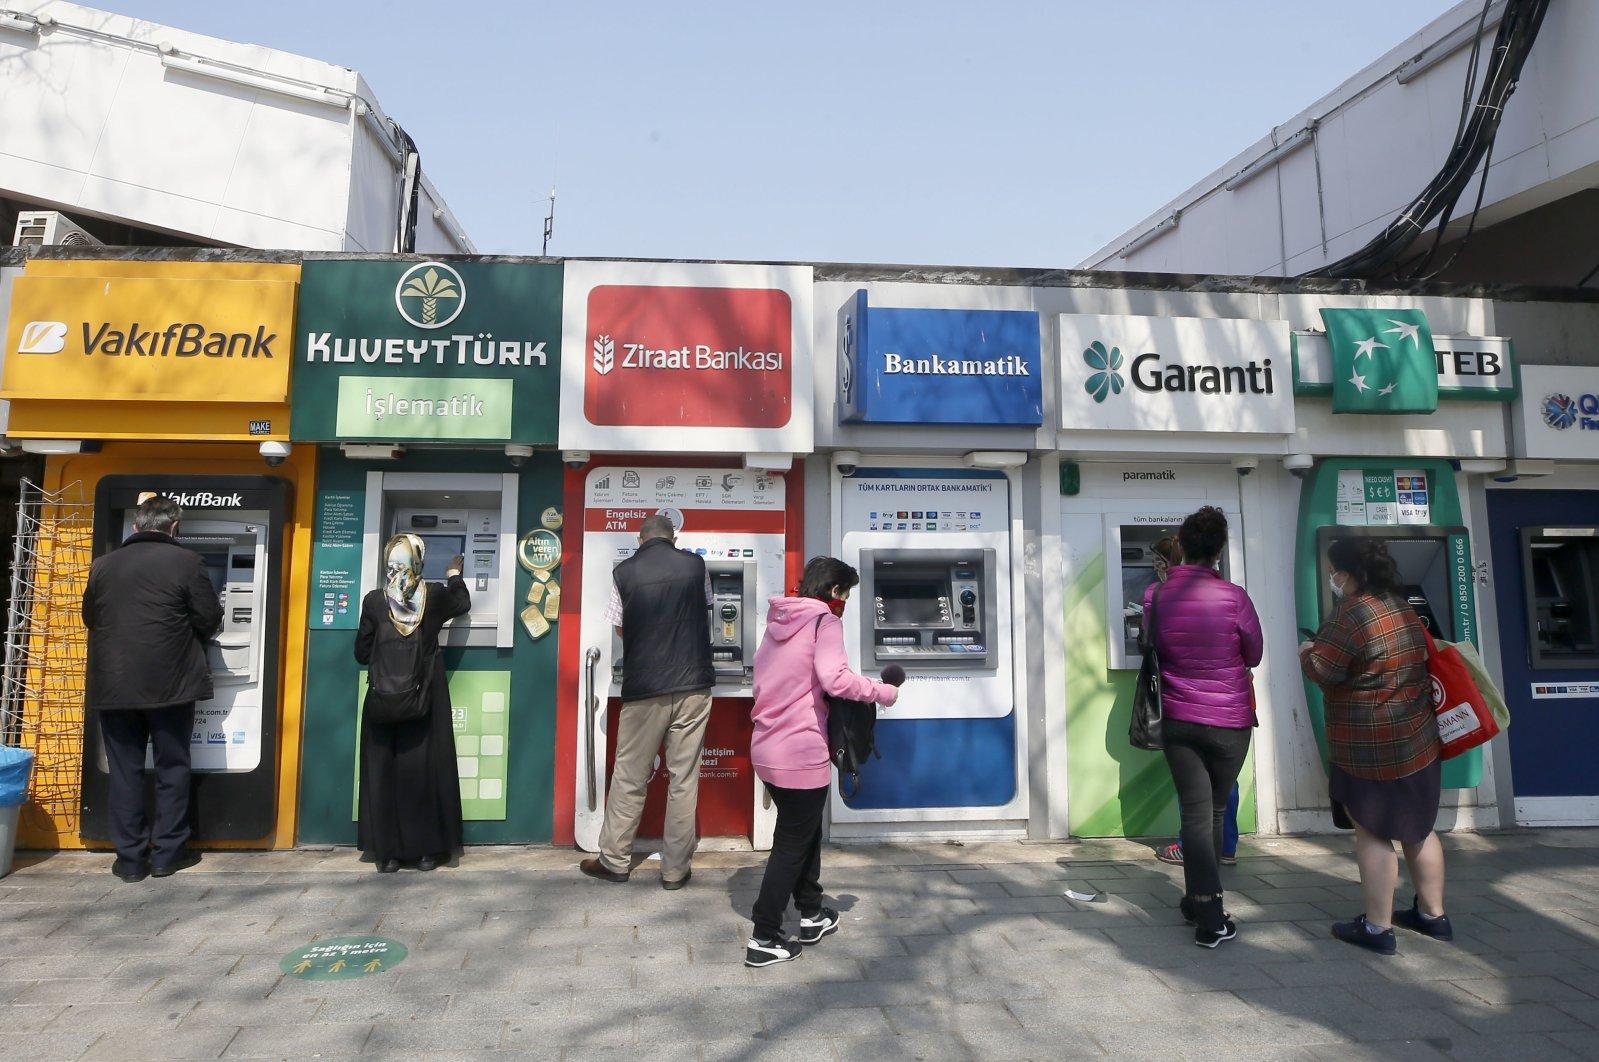 Customers use ATM machines in Istanbul's Üsküdar district, April 27, 2020